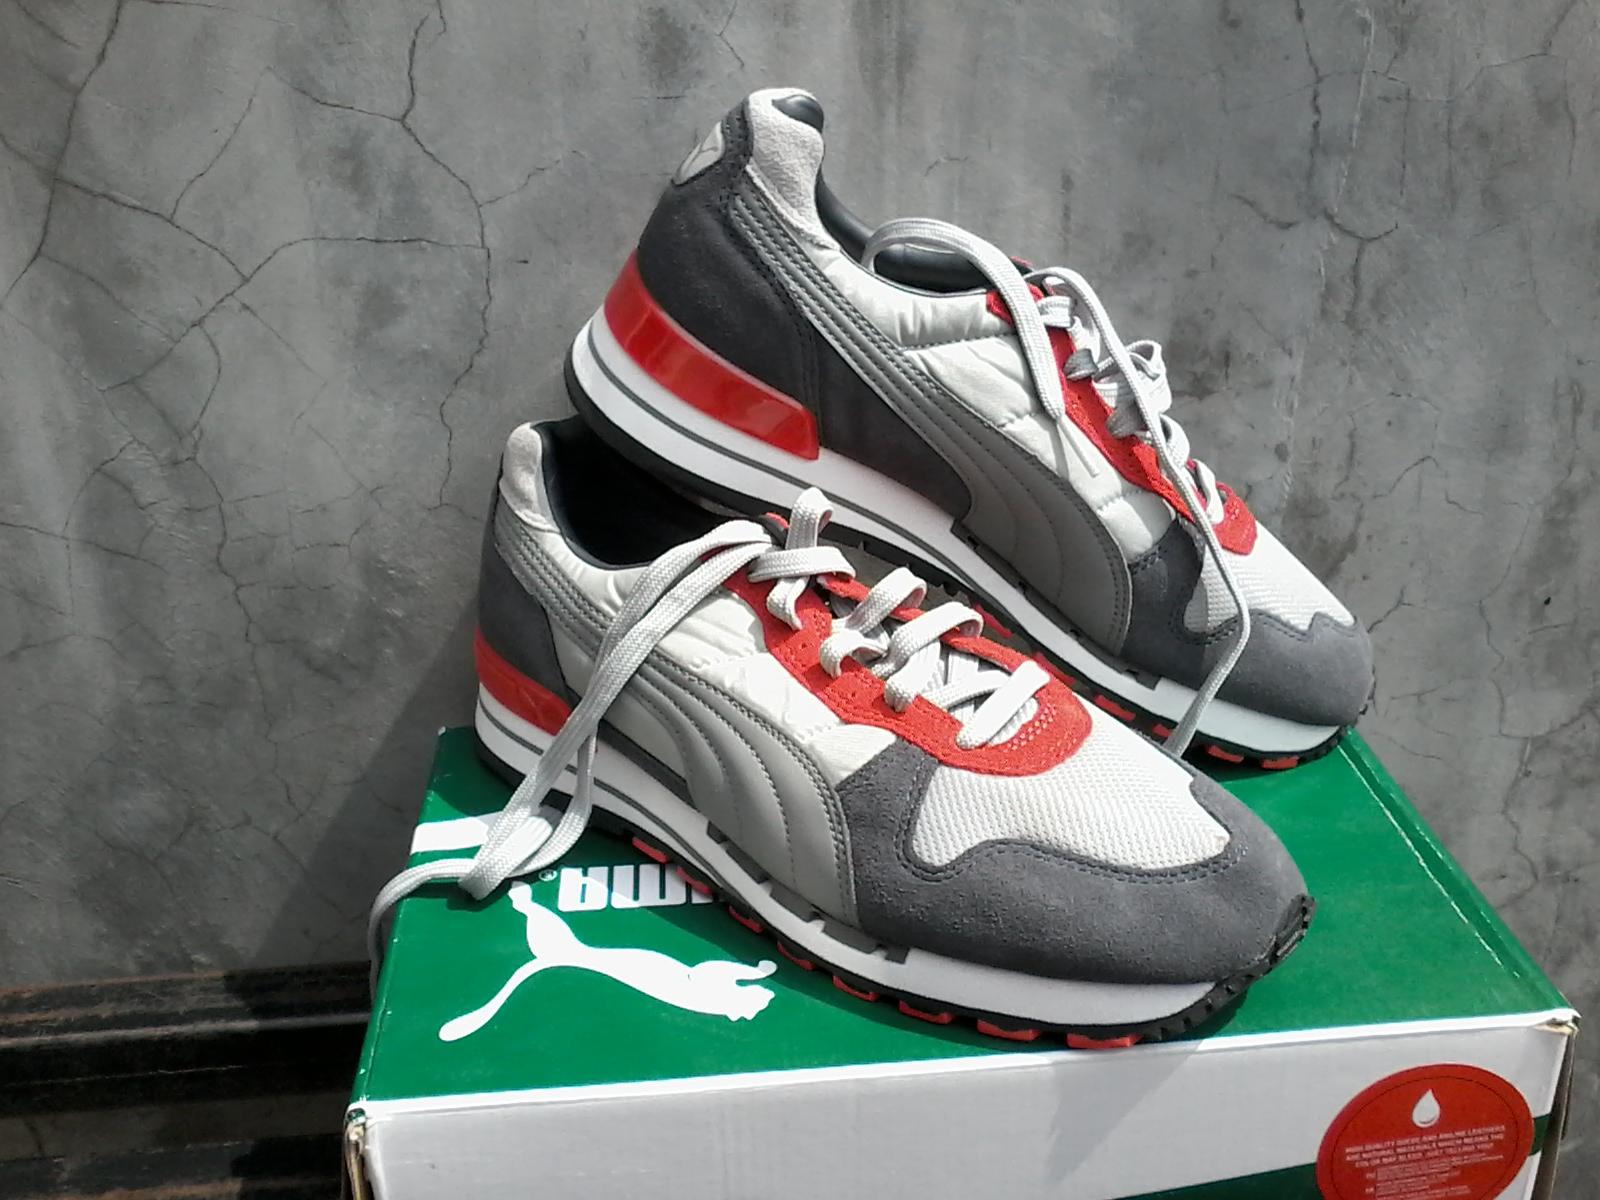 Jenis Sepatu   Sepatu Casual Seri   TX-3. Ready Stock Size   39 54c7c7e55d